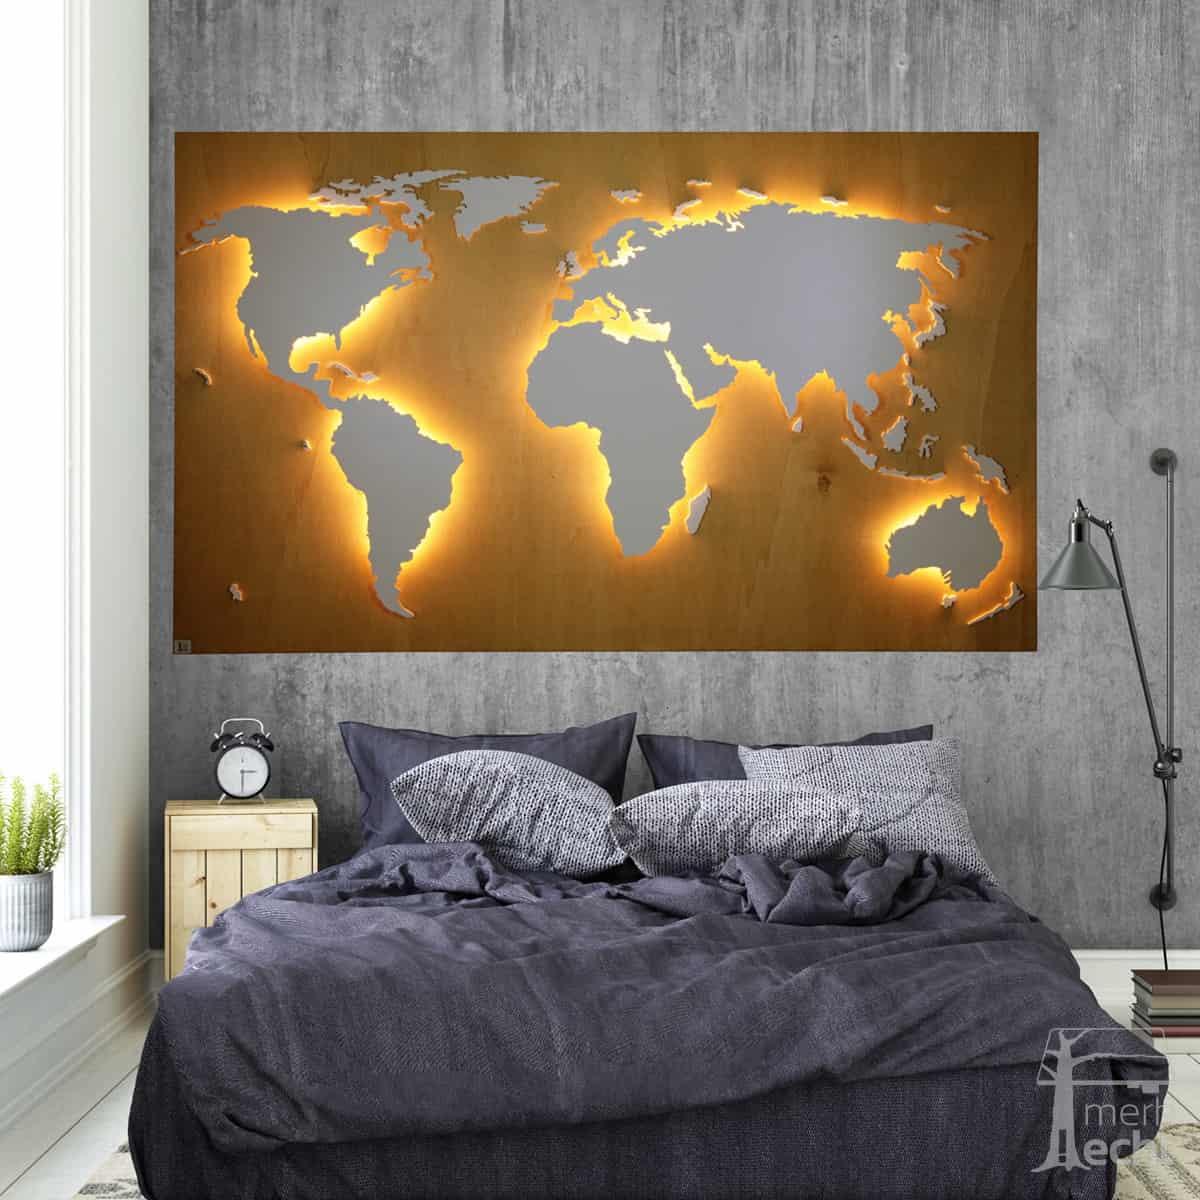 Weltkarte-Buche-Dekor-WeltkarteHolz-Wandbild-Beleuchtet-WeißesKontinente-Holz-Welt-Karte-XXL-WelkartenAusHolz-WeißeKontinente-KontinenteHolz